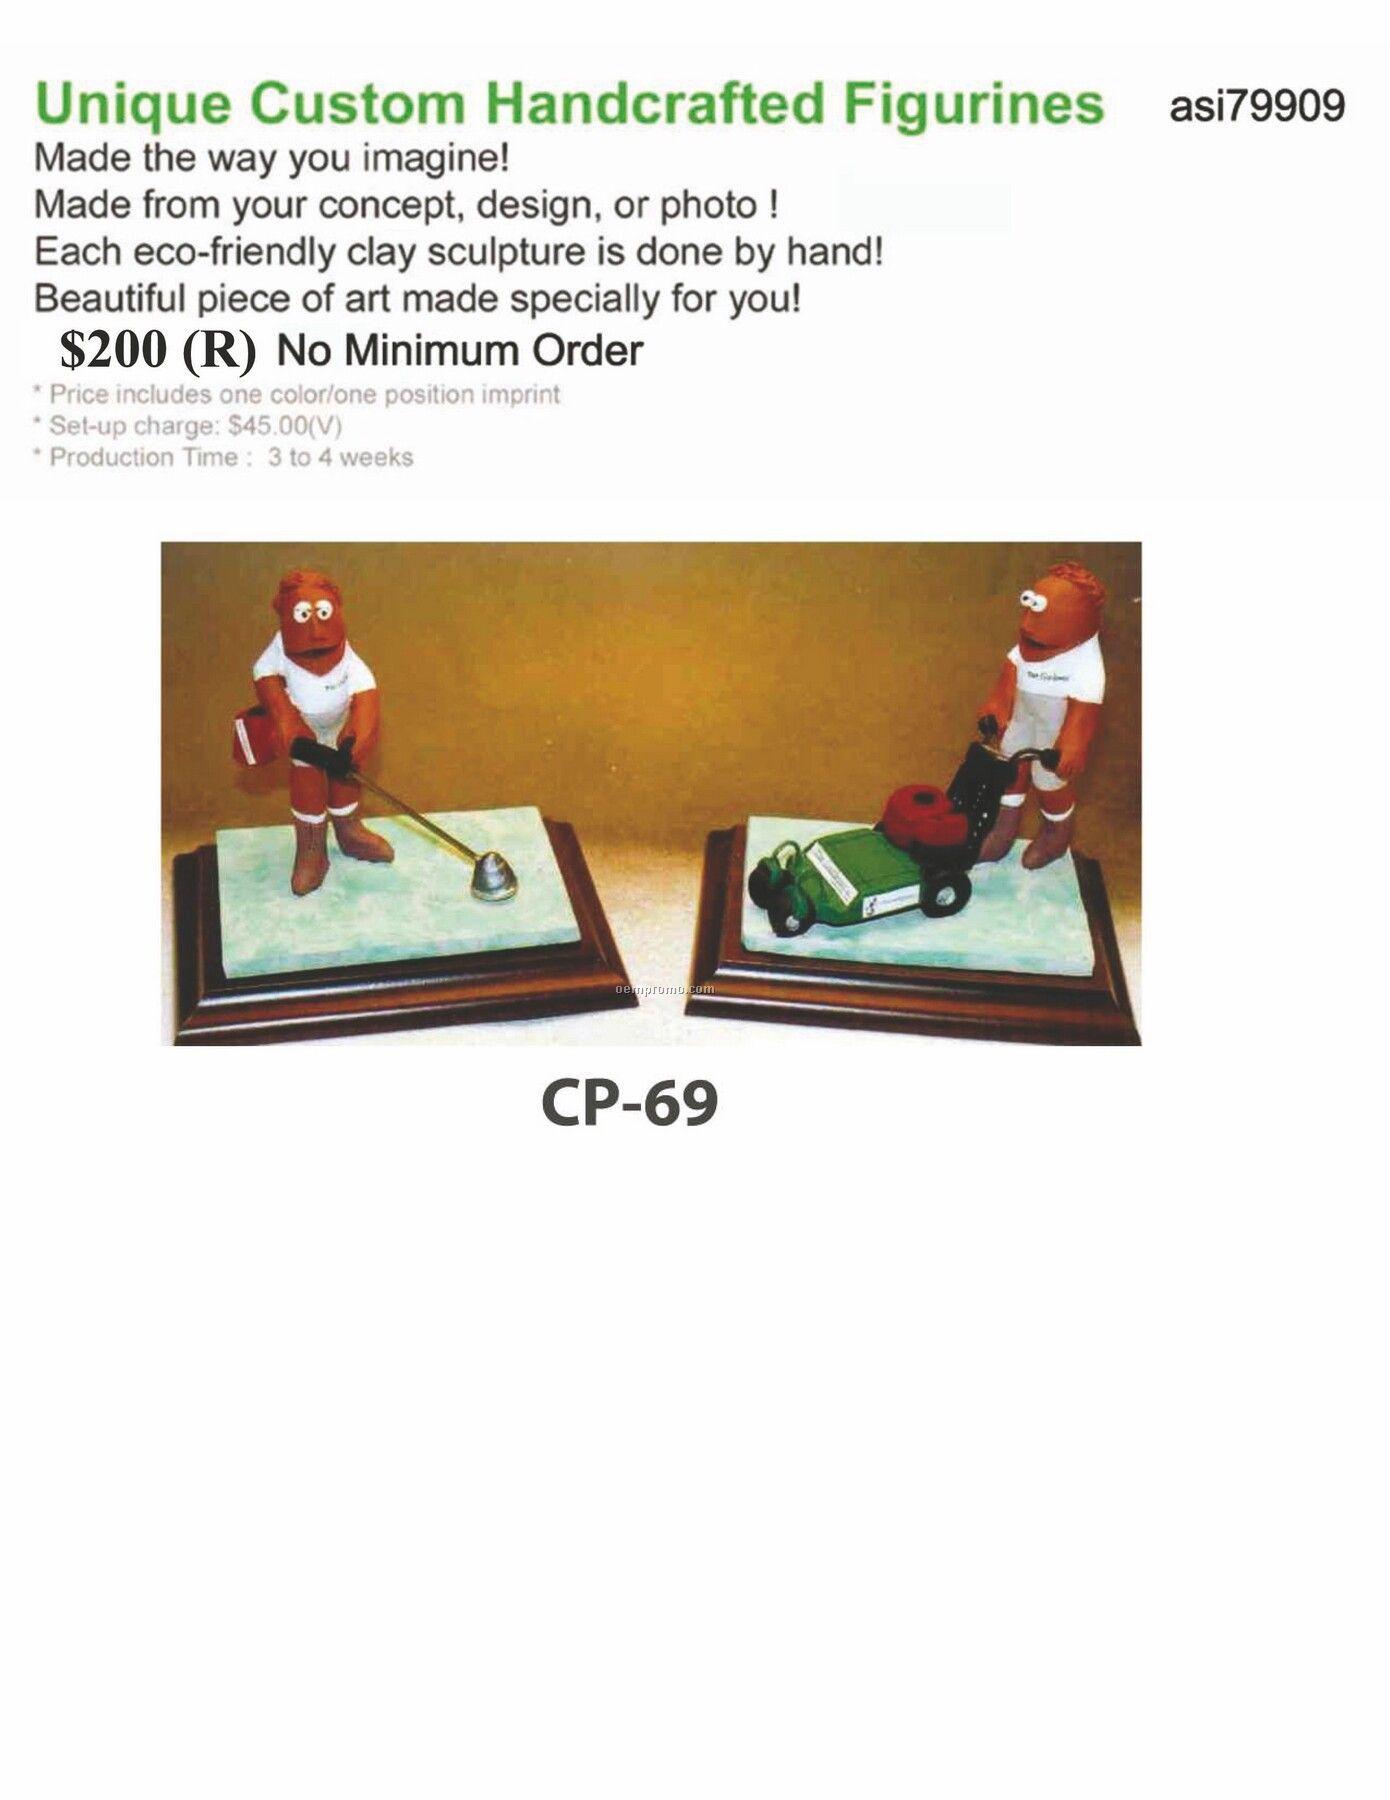 Custom Handcrafted Figurine